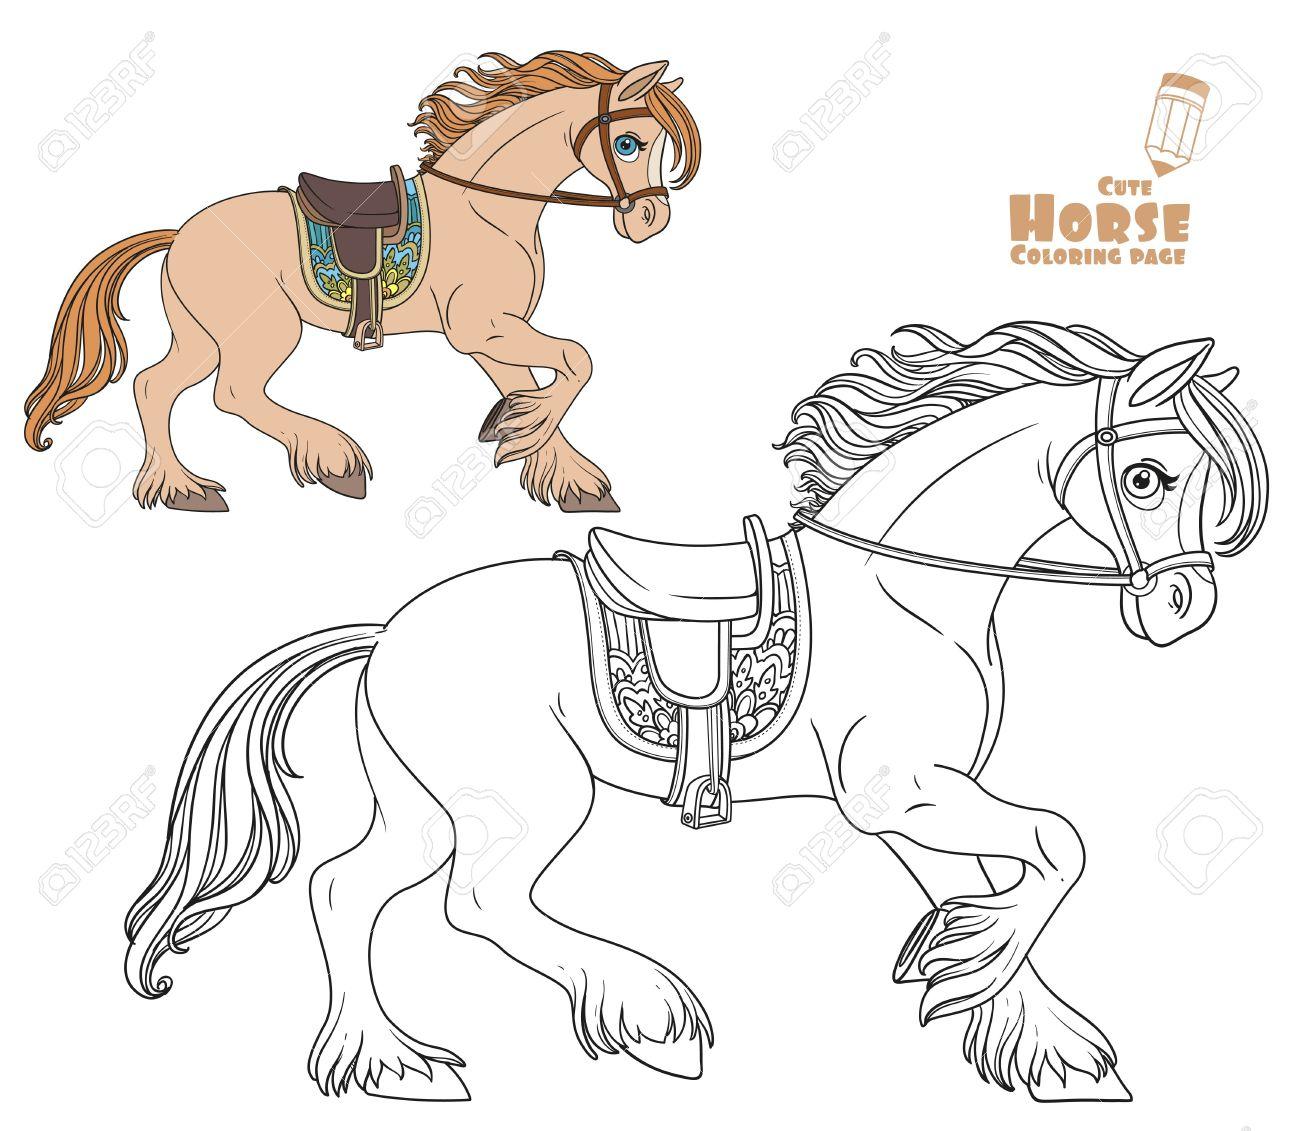 cute cartoon horse harnessed in a harness runs forward coloring